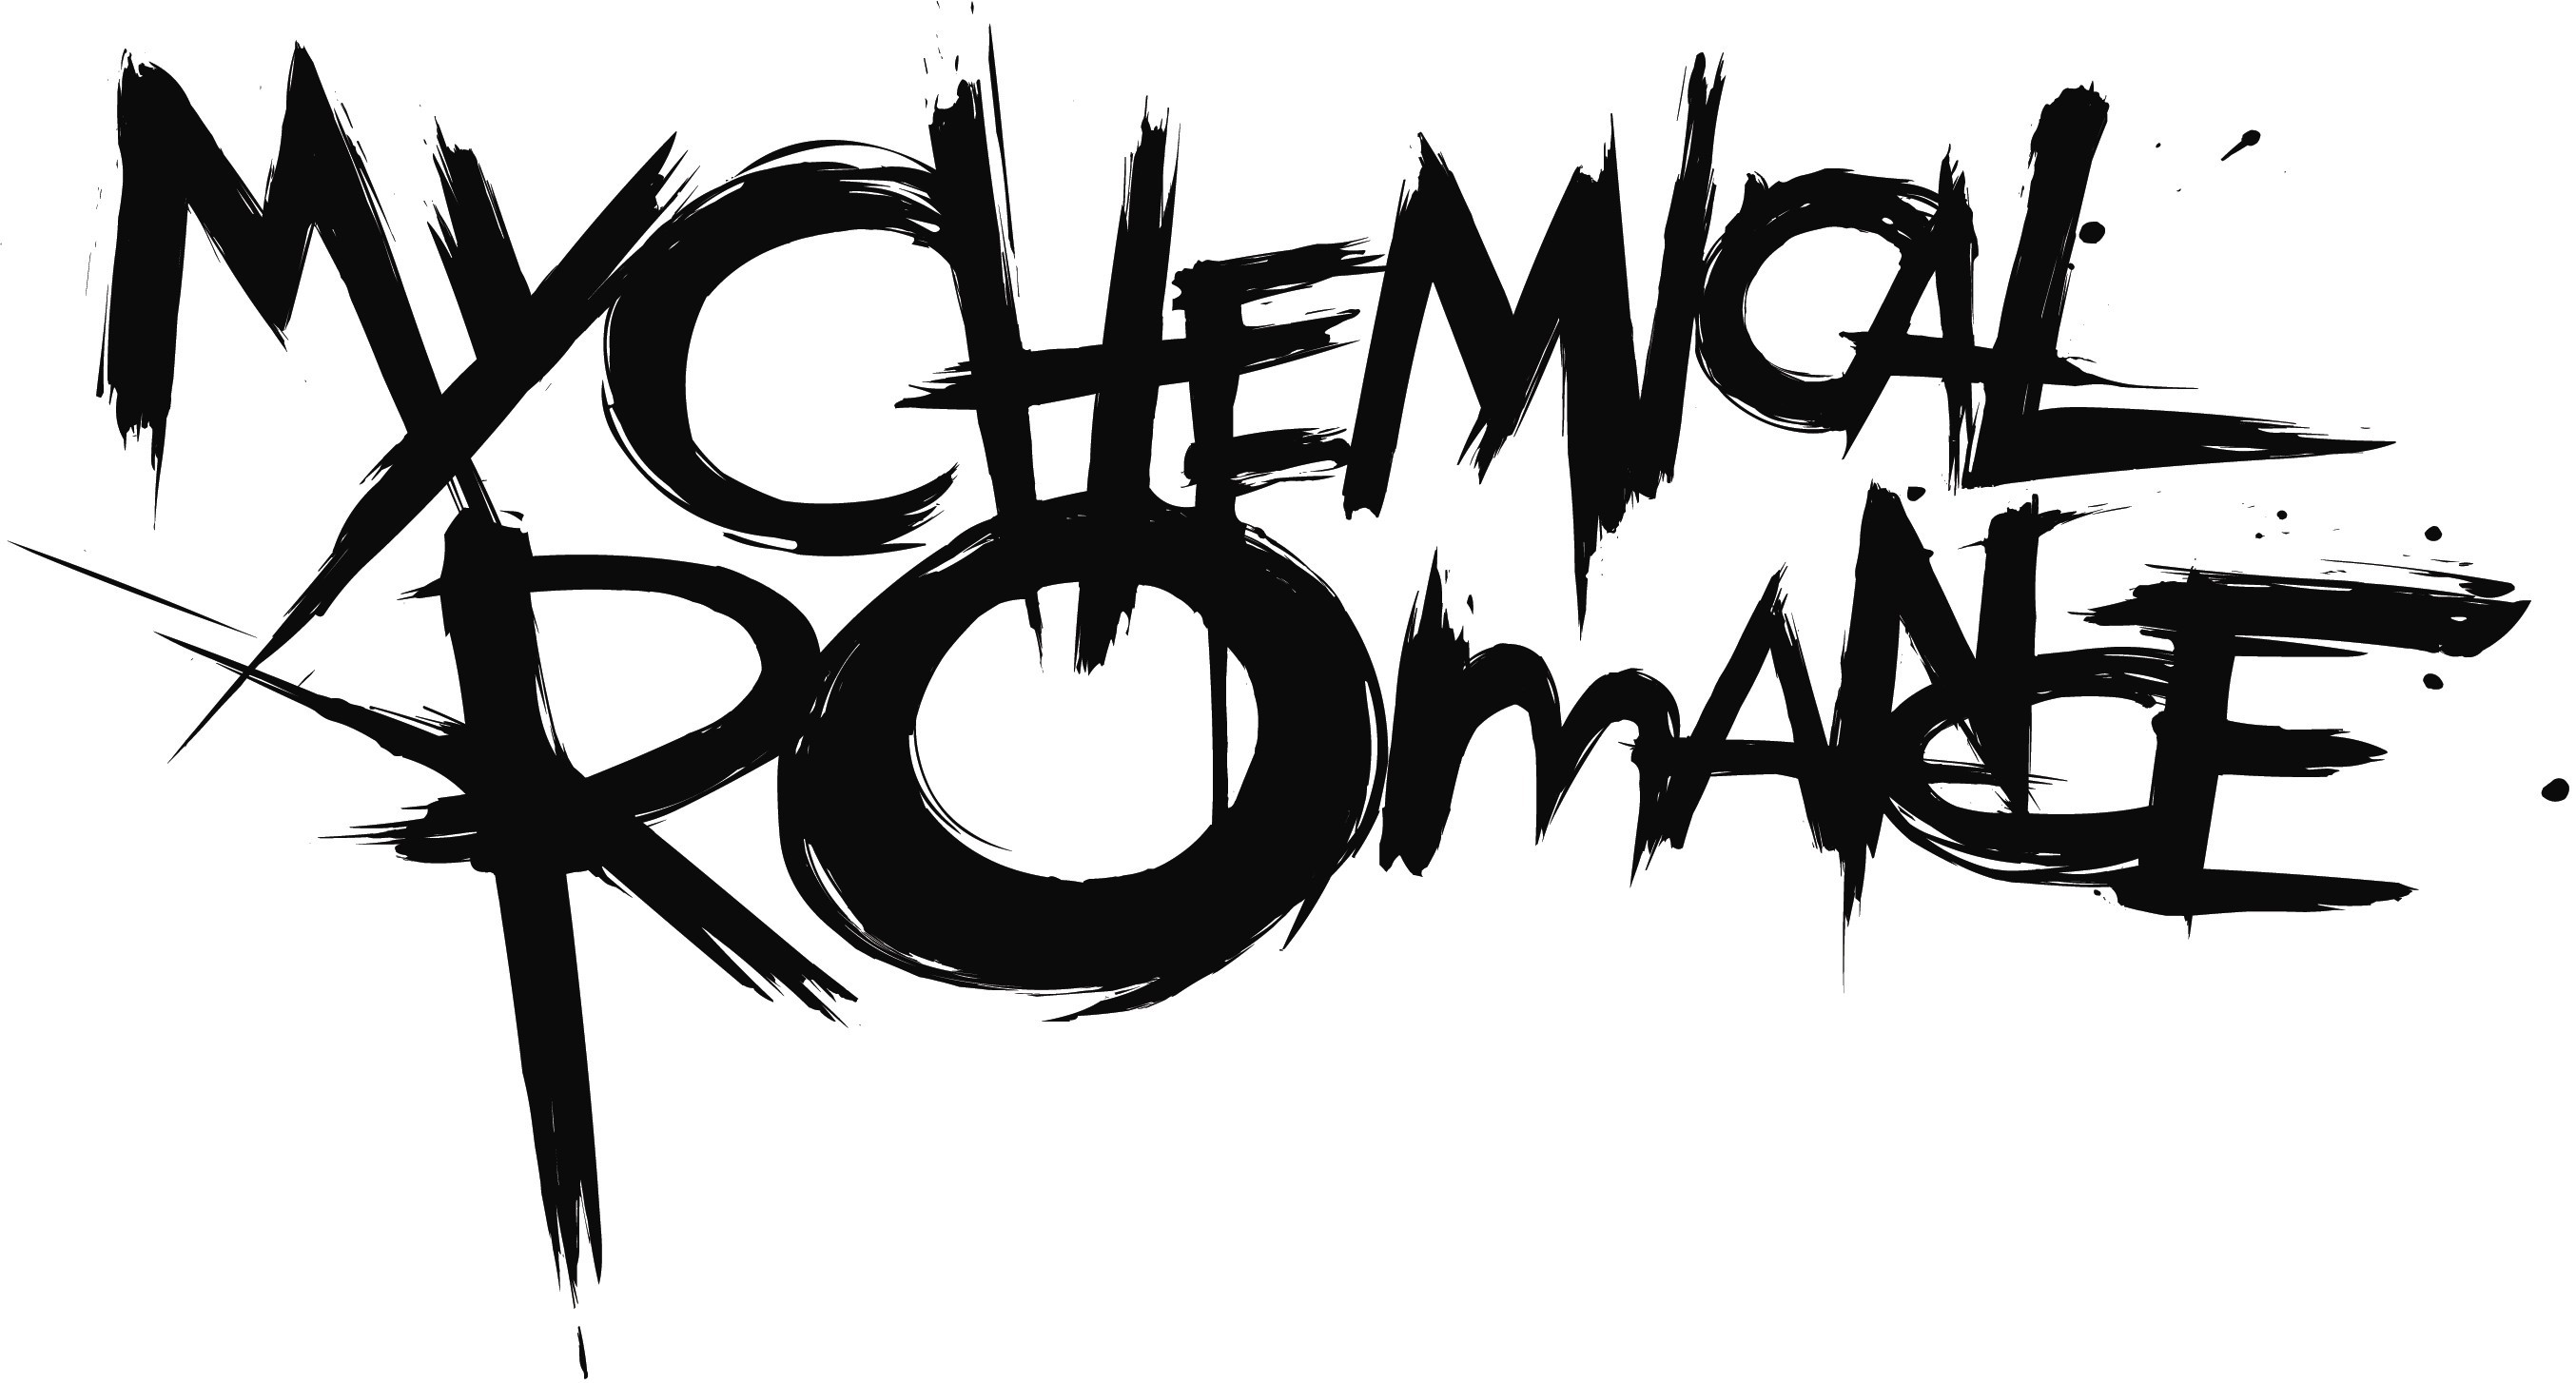 2708x1454 My Chemical Romance Wallpaper HD 2708A 1454